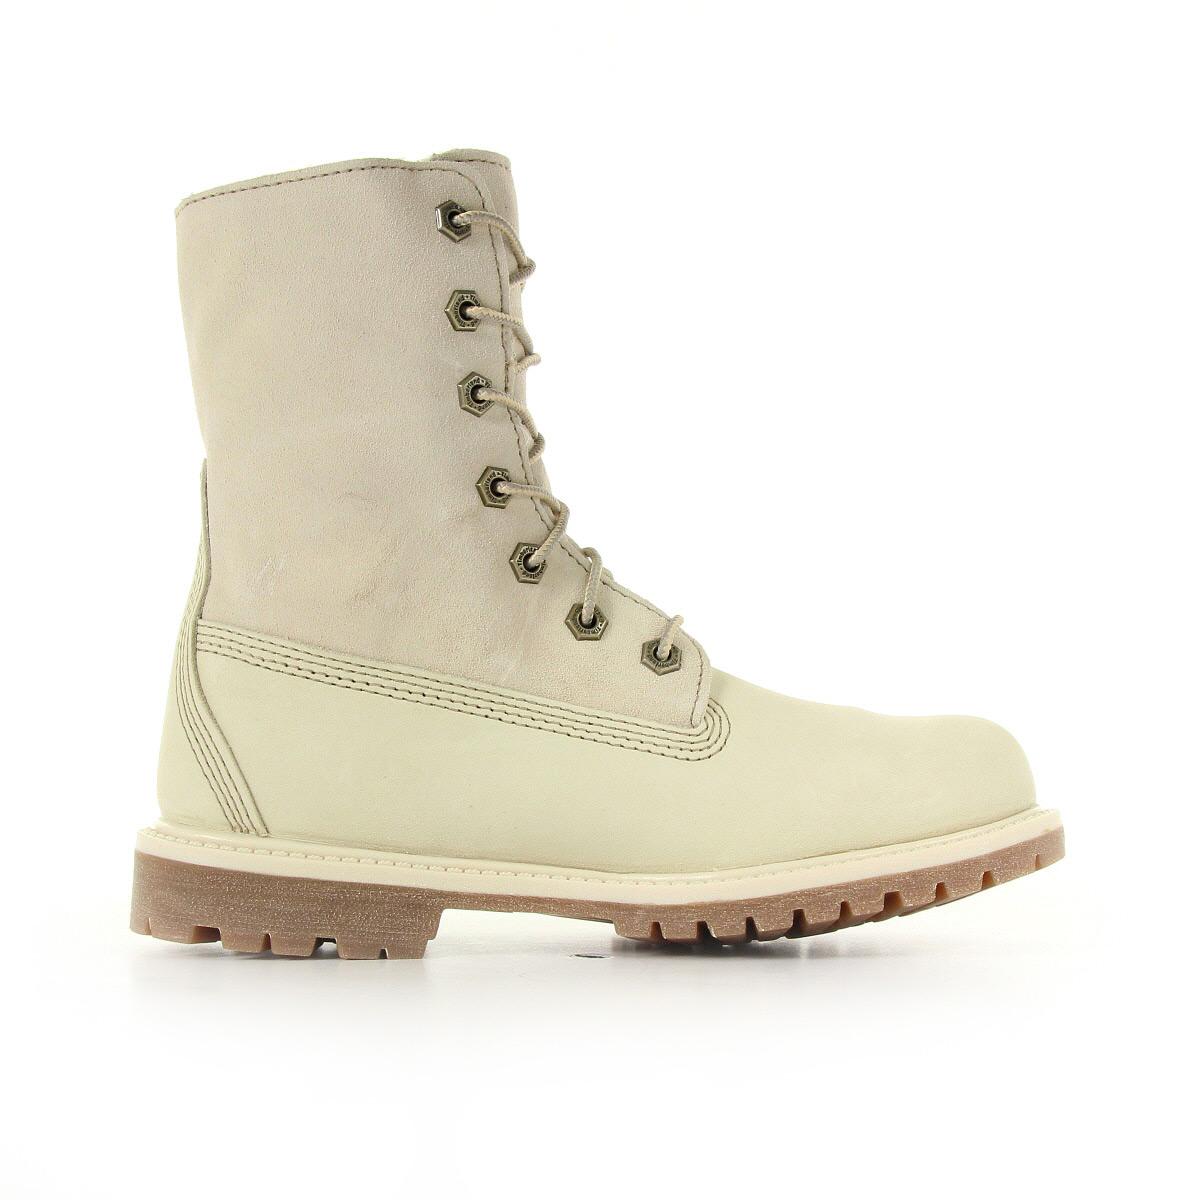 Bottes-Timberland-femme-Authentics-Teddy-Fleece-Winter-White-taille-Beige-Cuir